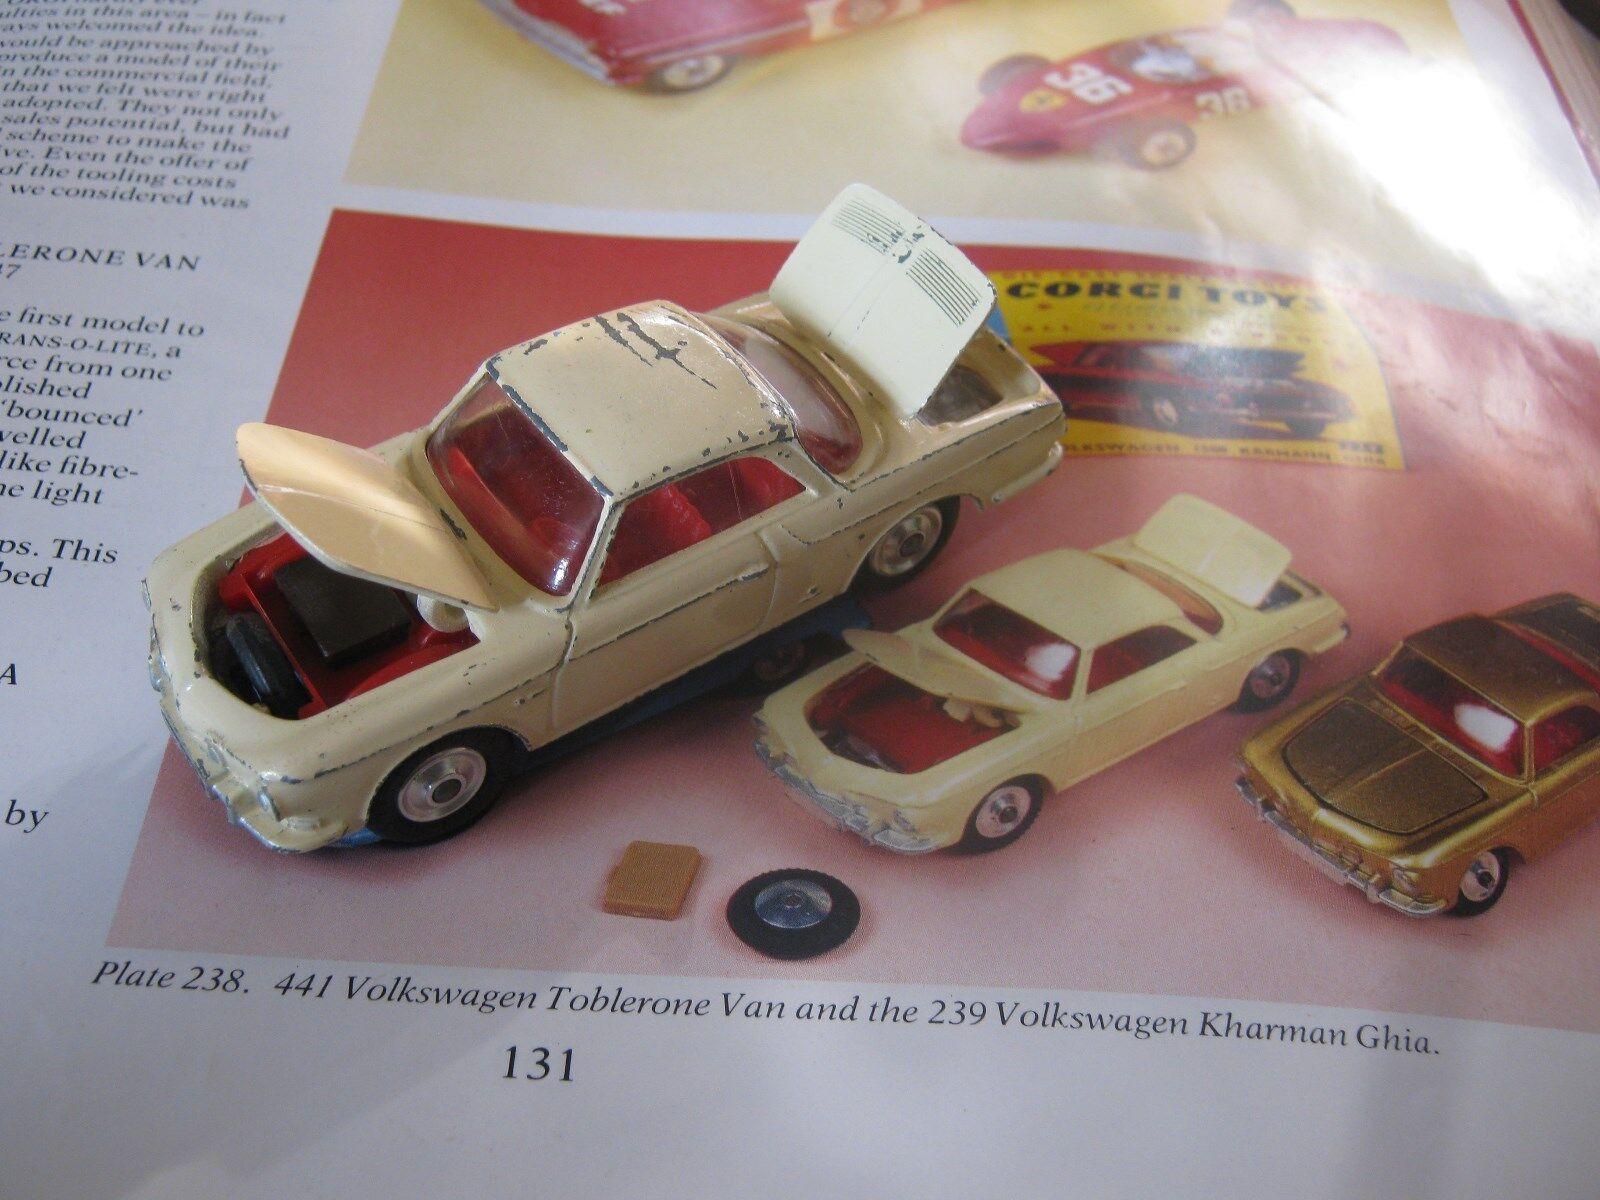 CORGI 239 VW KARMANN GHIA PLAYWORN ORIGINAL UNTOUCHED AS SHOWN +2016 BADGE